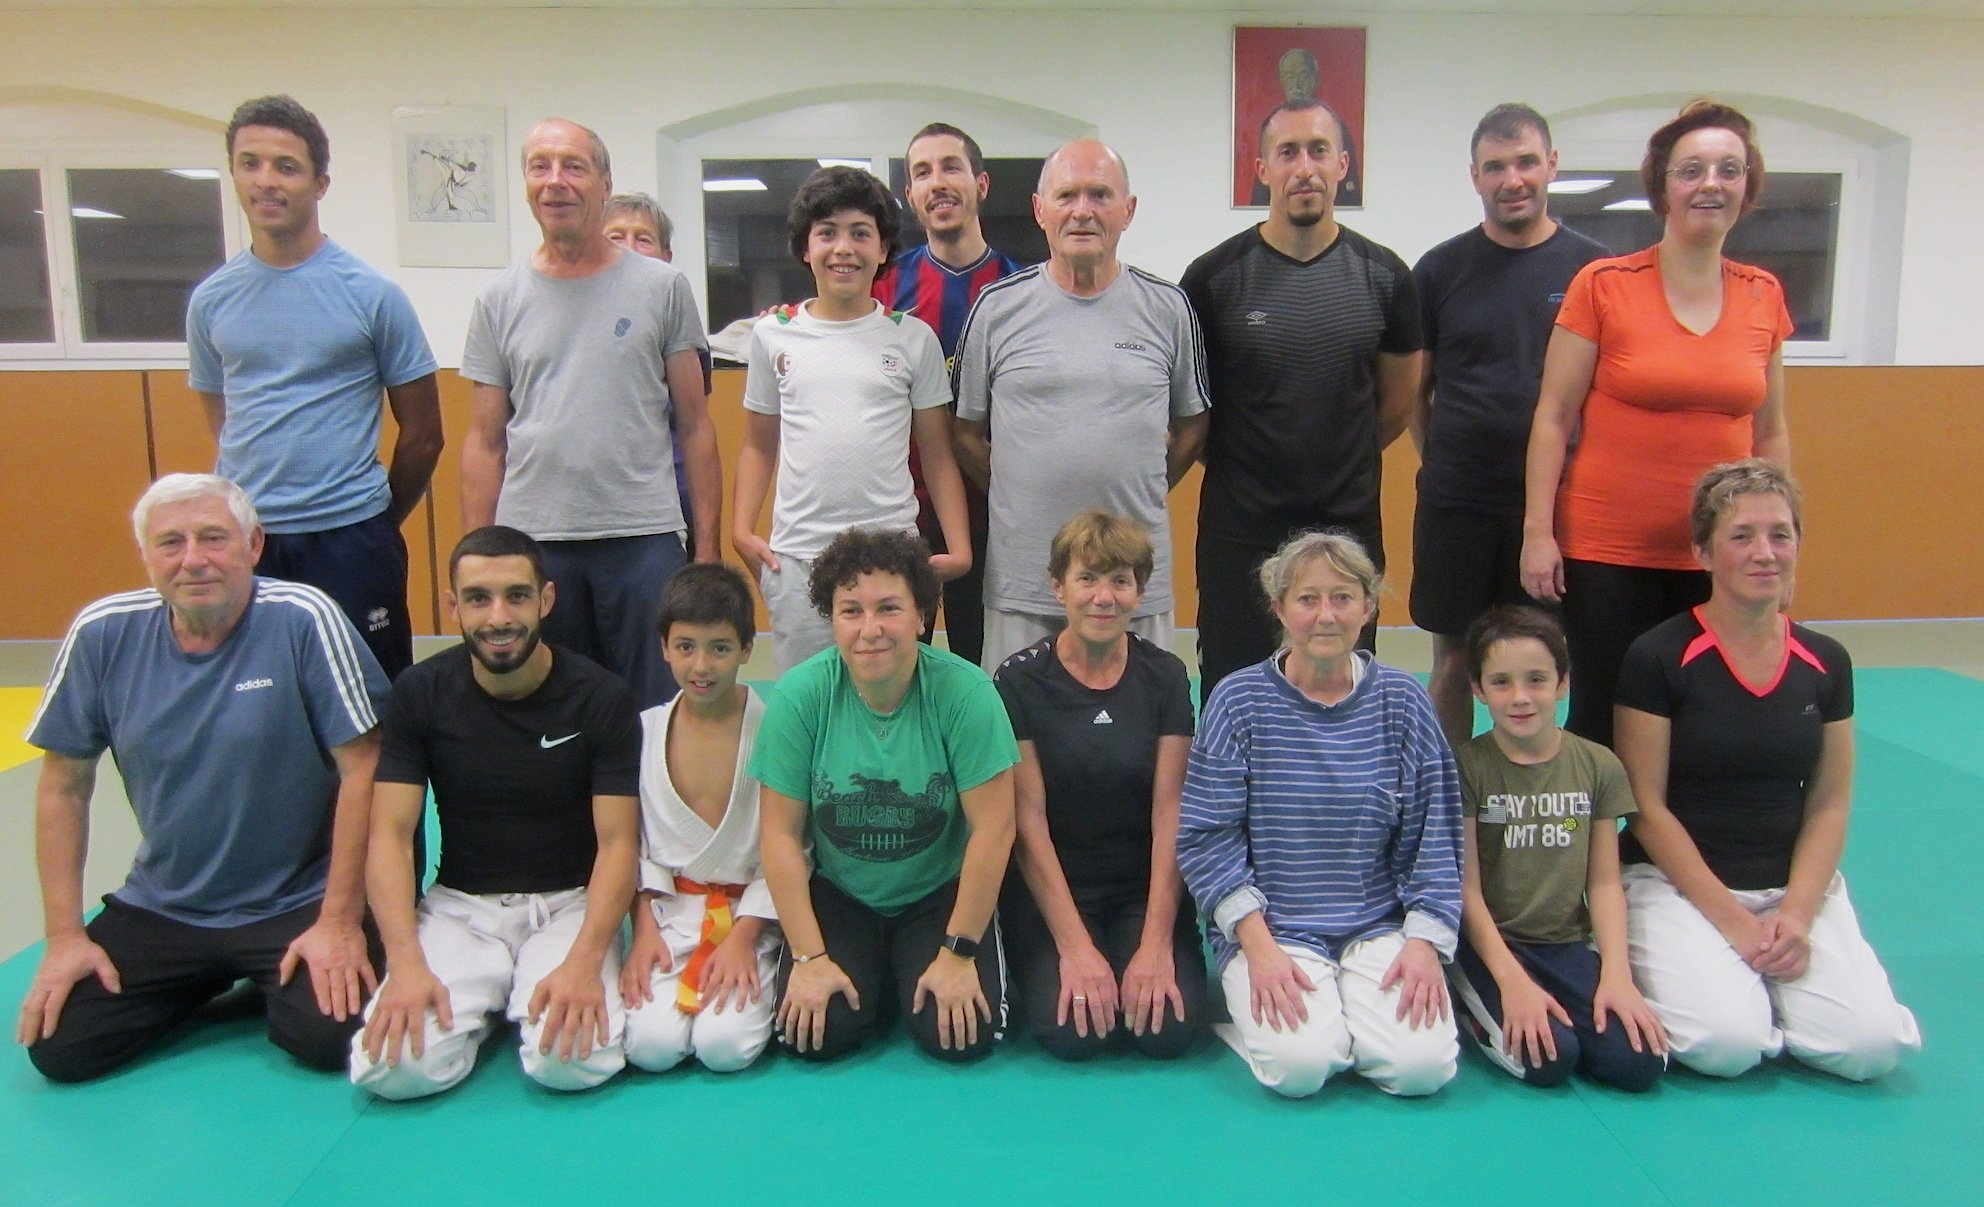 LE CREUSOT: Discovering Taïso on the judo membership